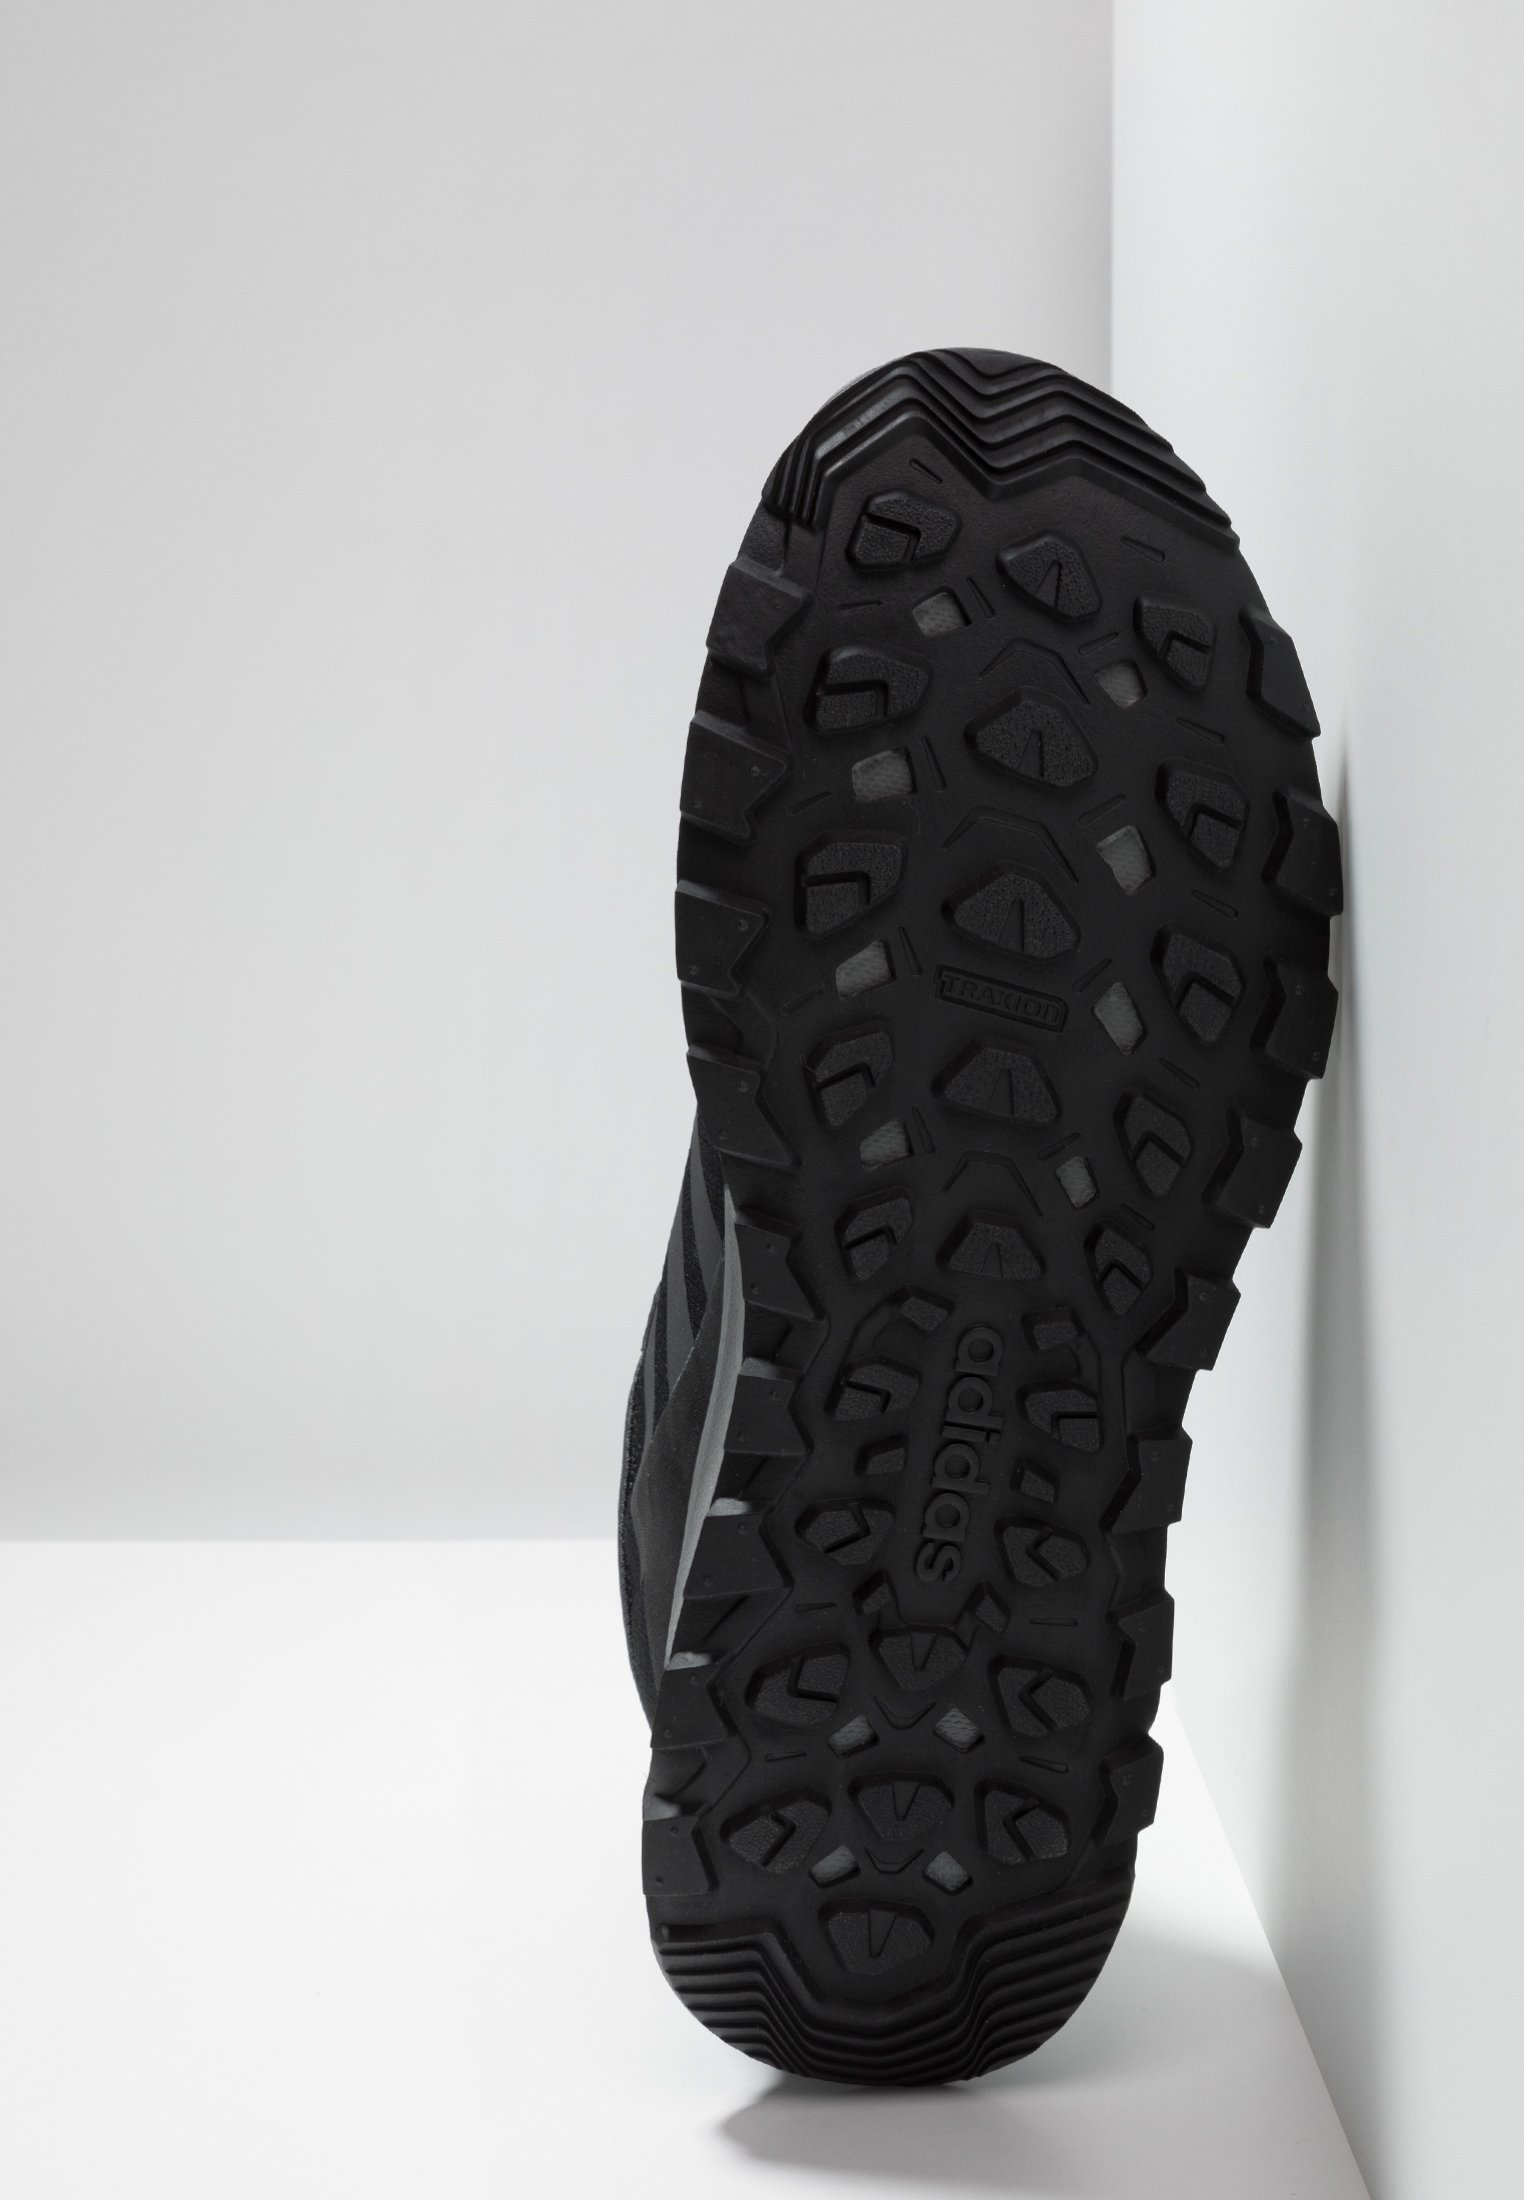 Core grey Six De Response Performance Adidas TrailChaussures Black Running nO8wPXk0